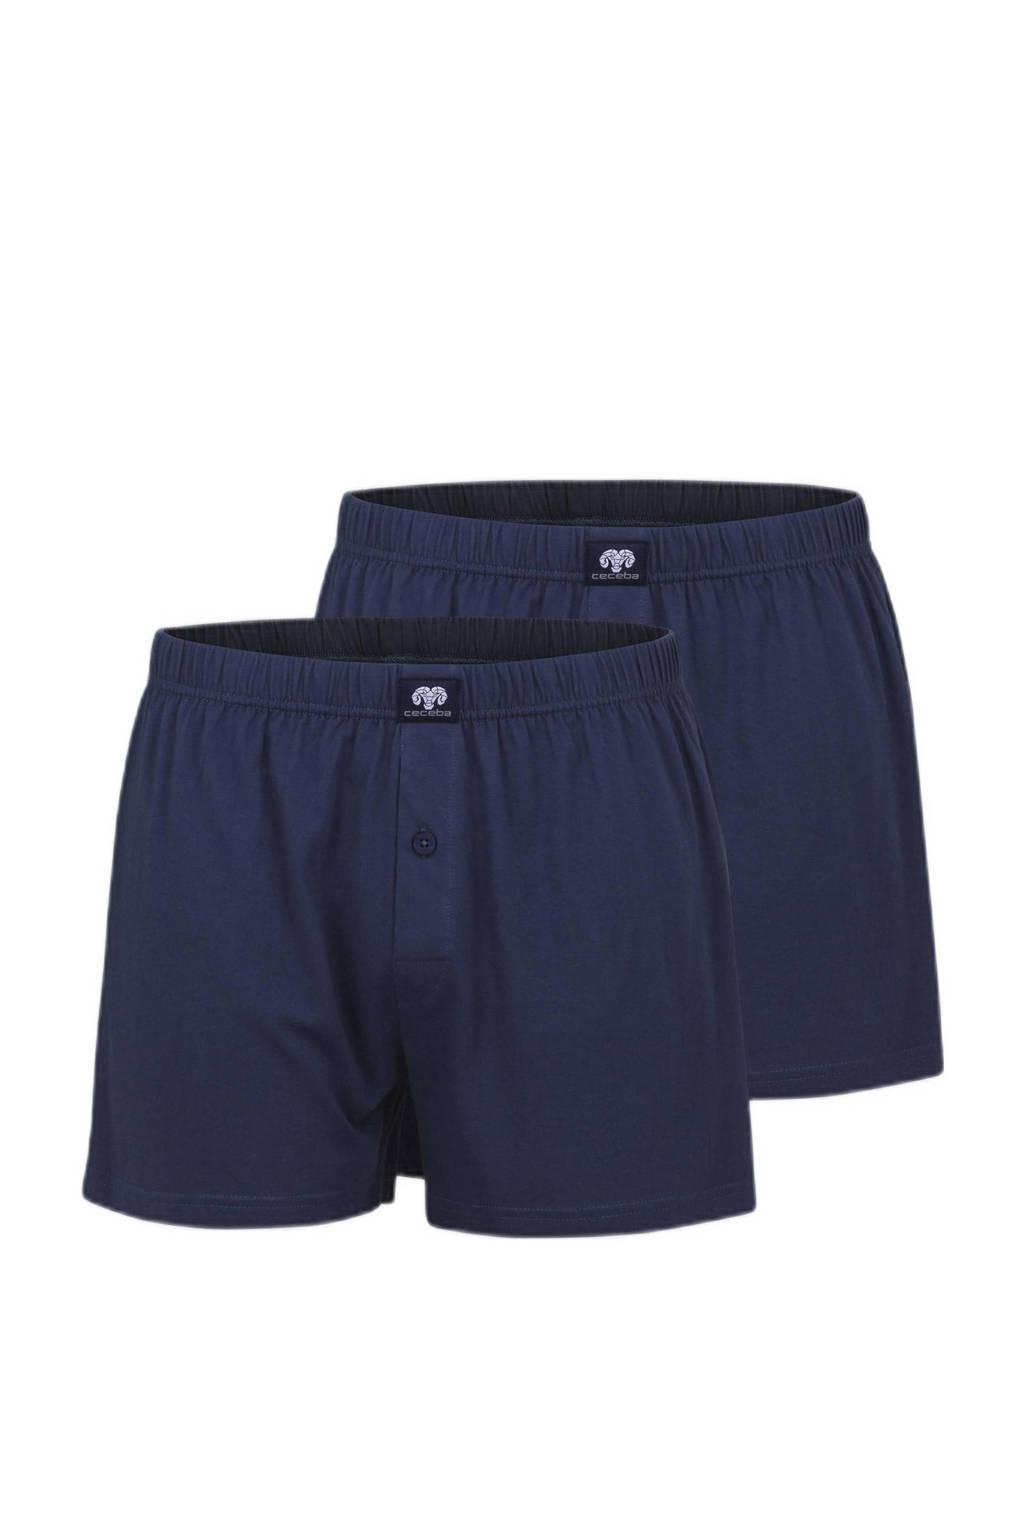 Ceceba +size boxershort (set van 2), Blauw